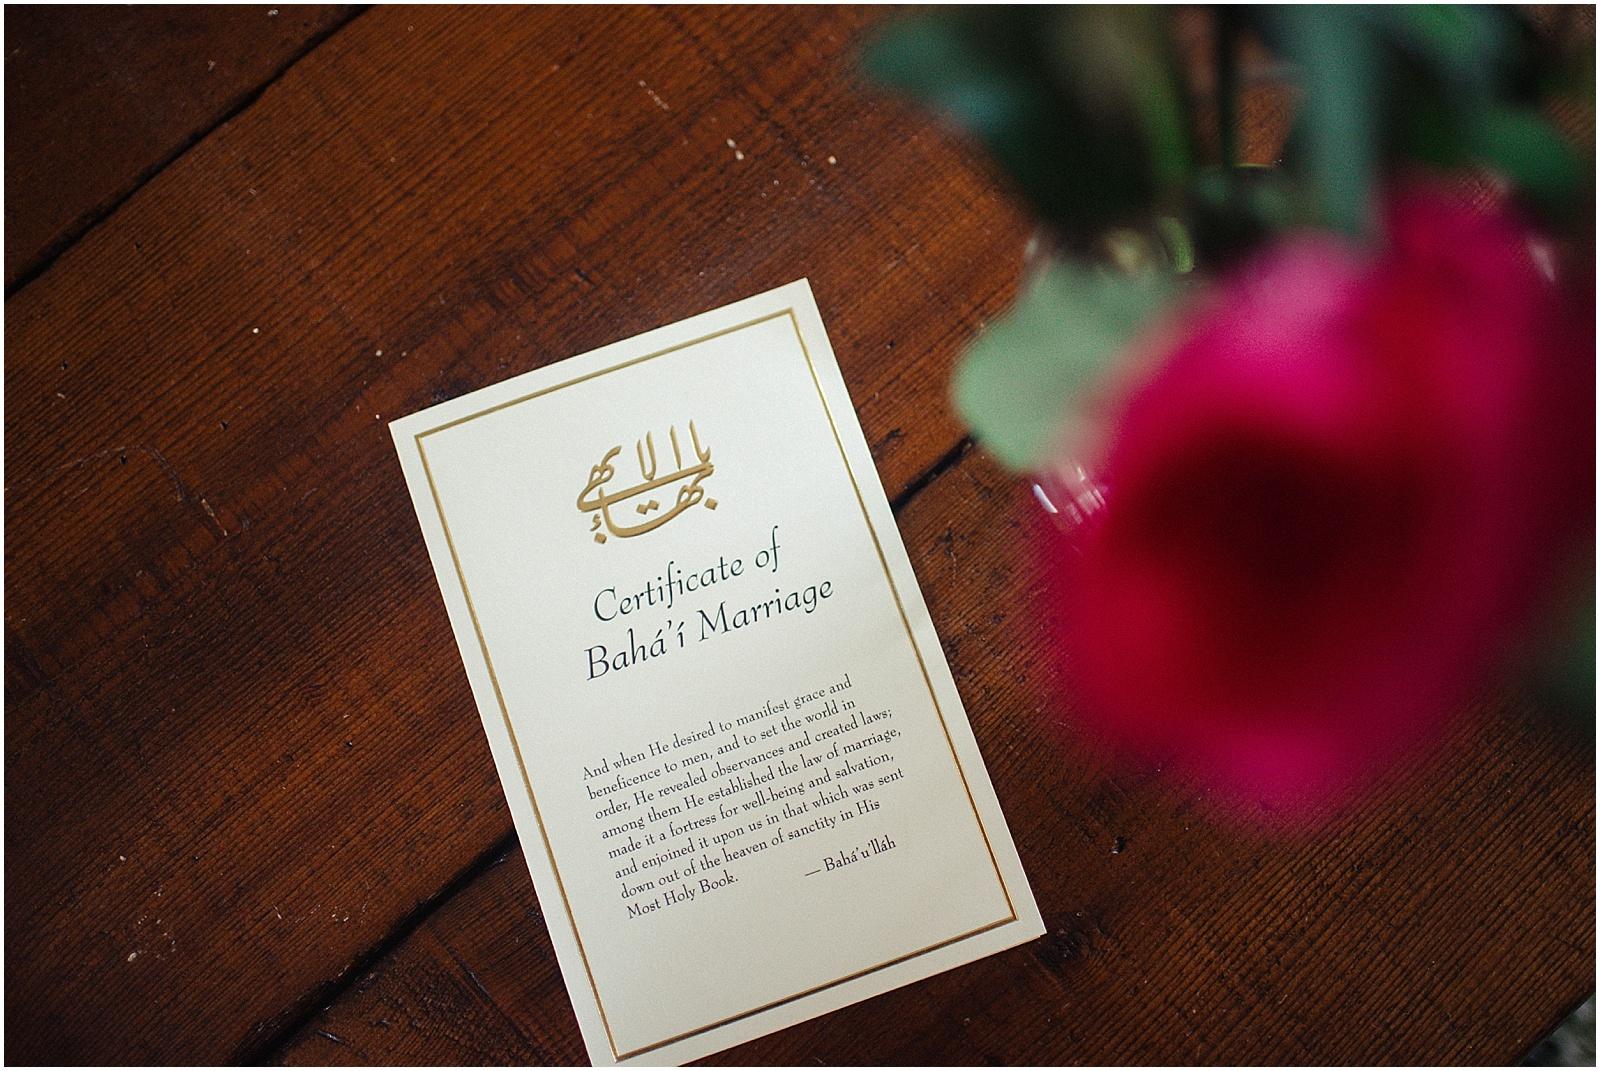 Bahai_Marriage_Certificate